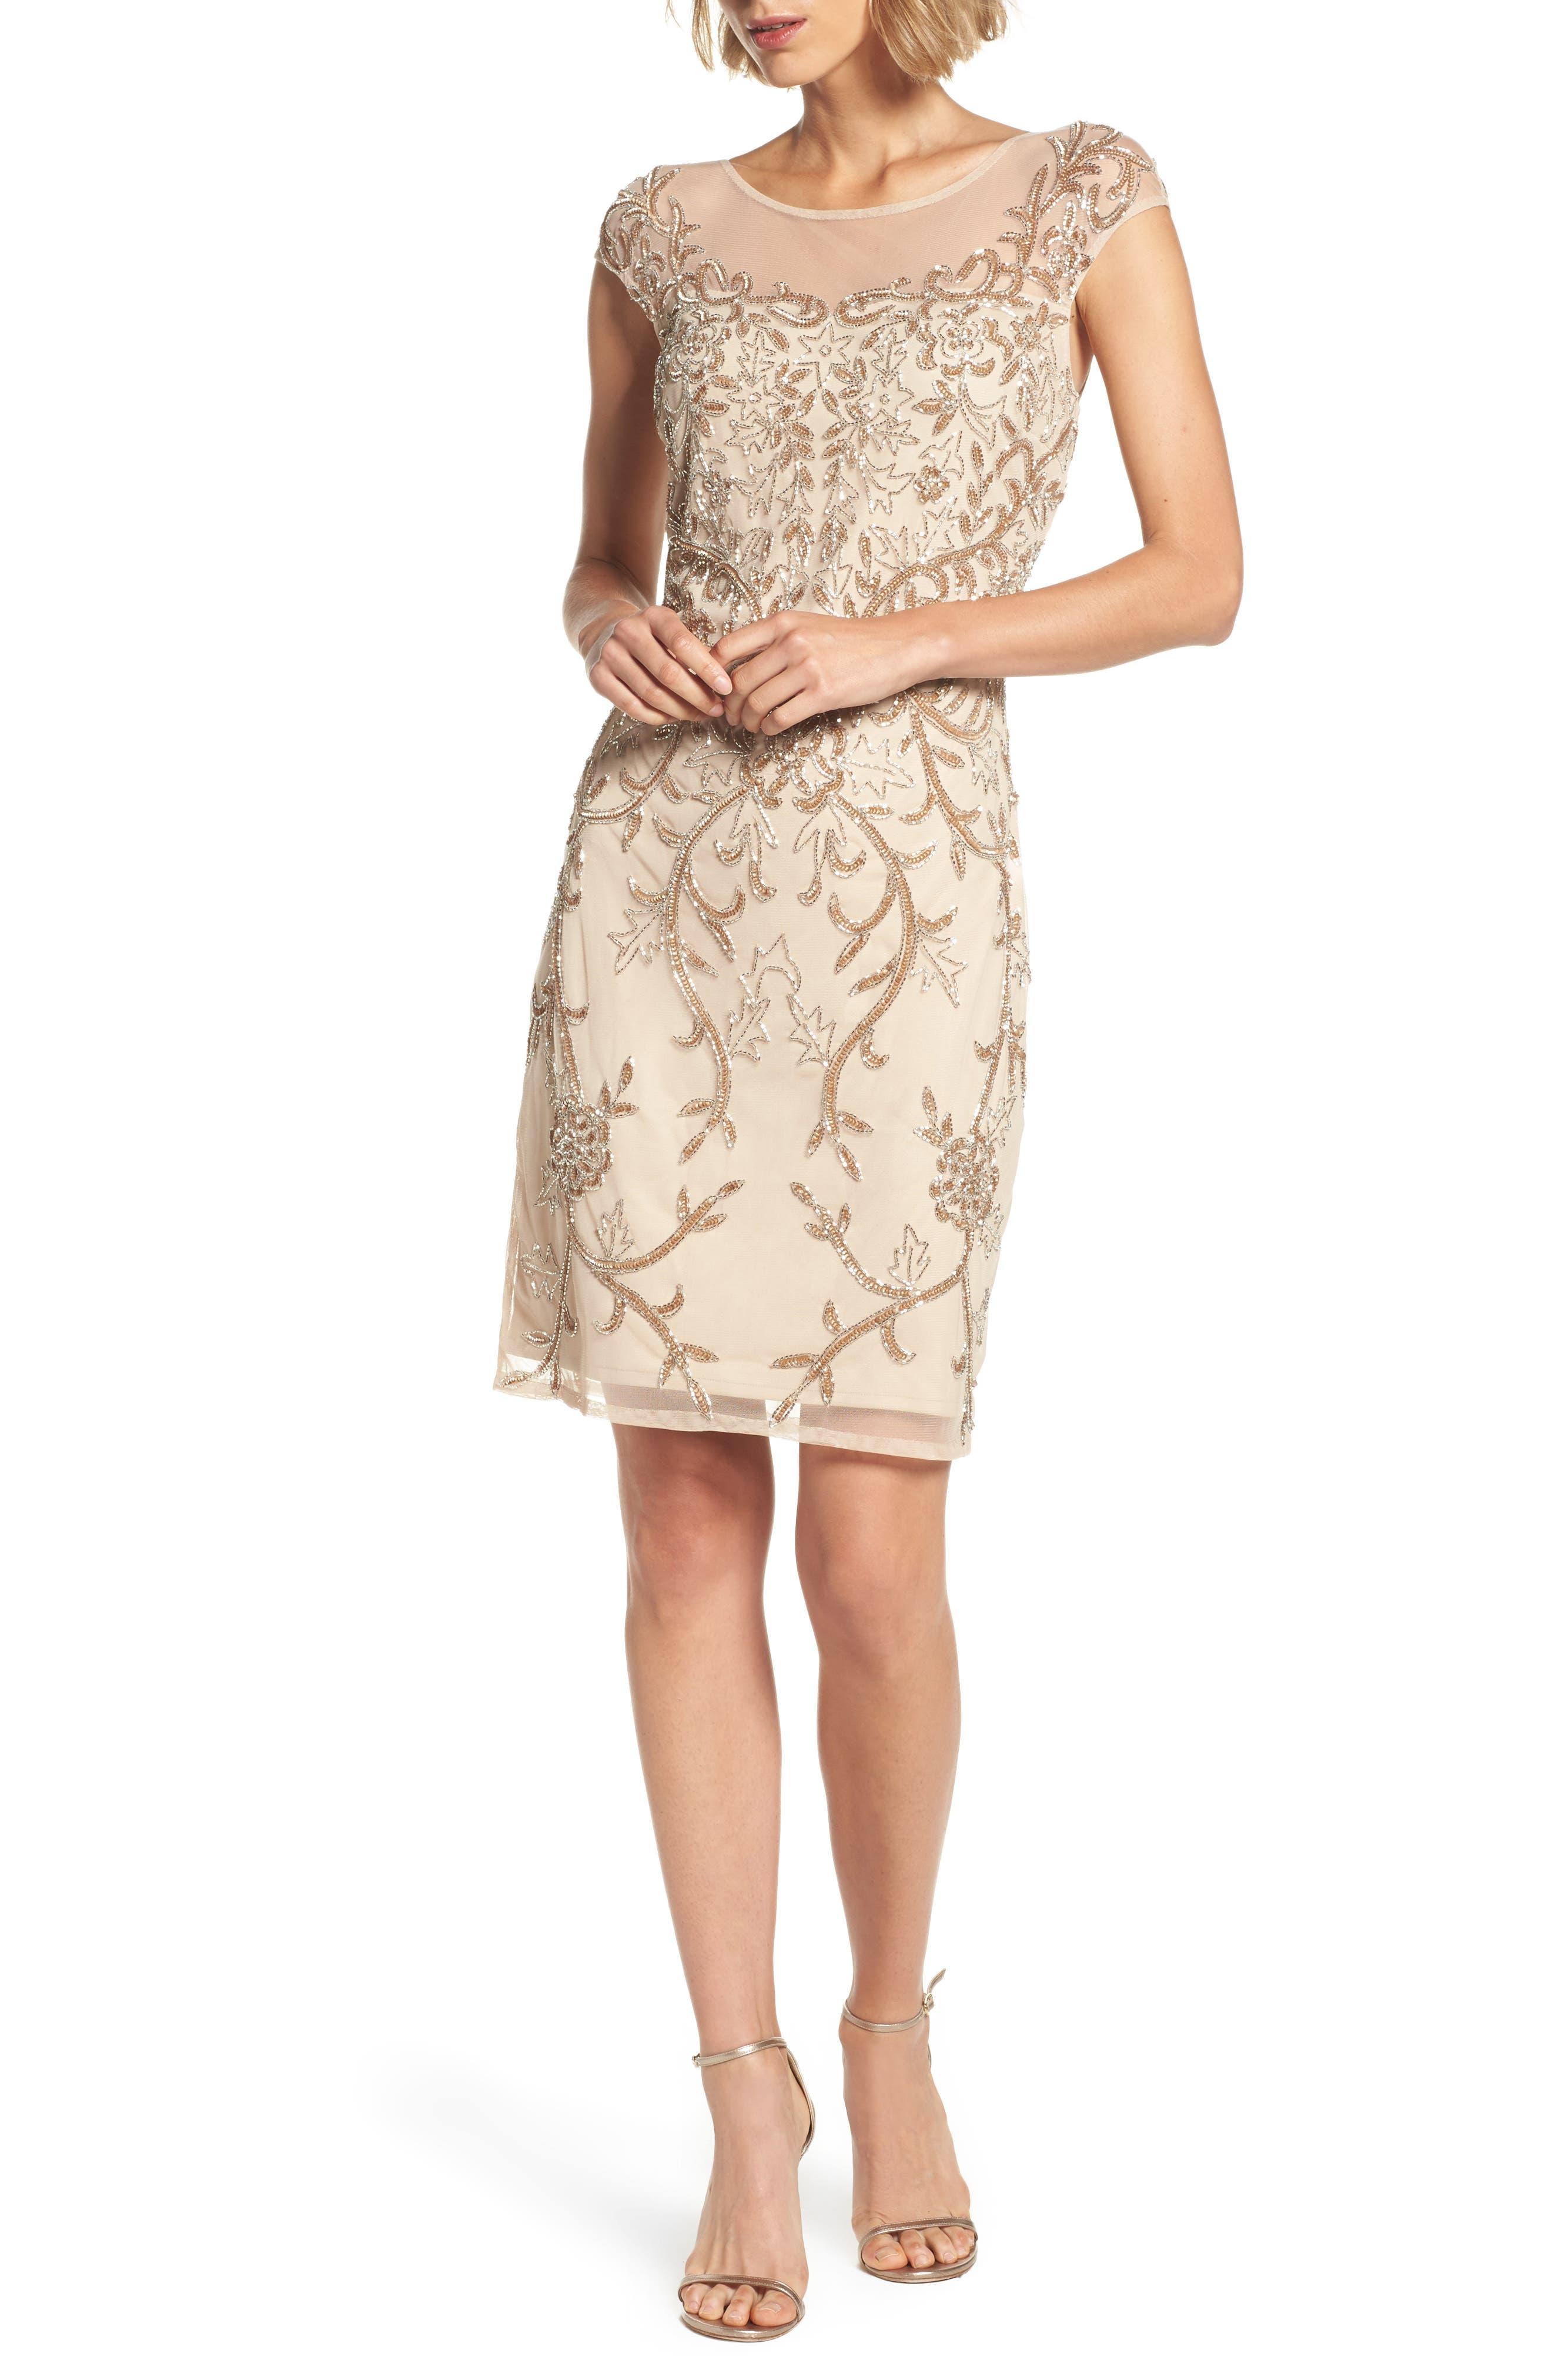 Alternate Image 1 Selected - Pisarro Nights Embellished Illusion Sheath Dress (Regular & Petite)